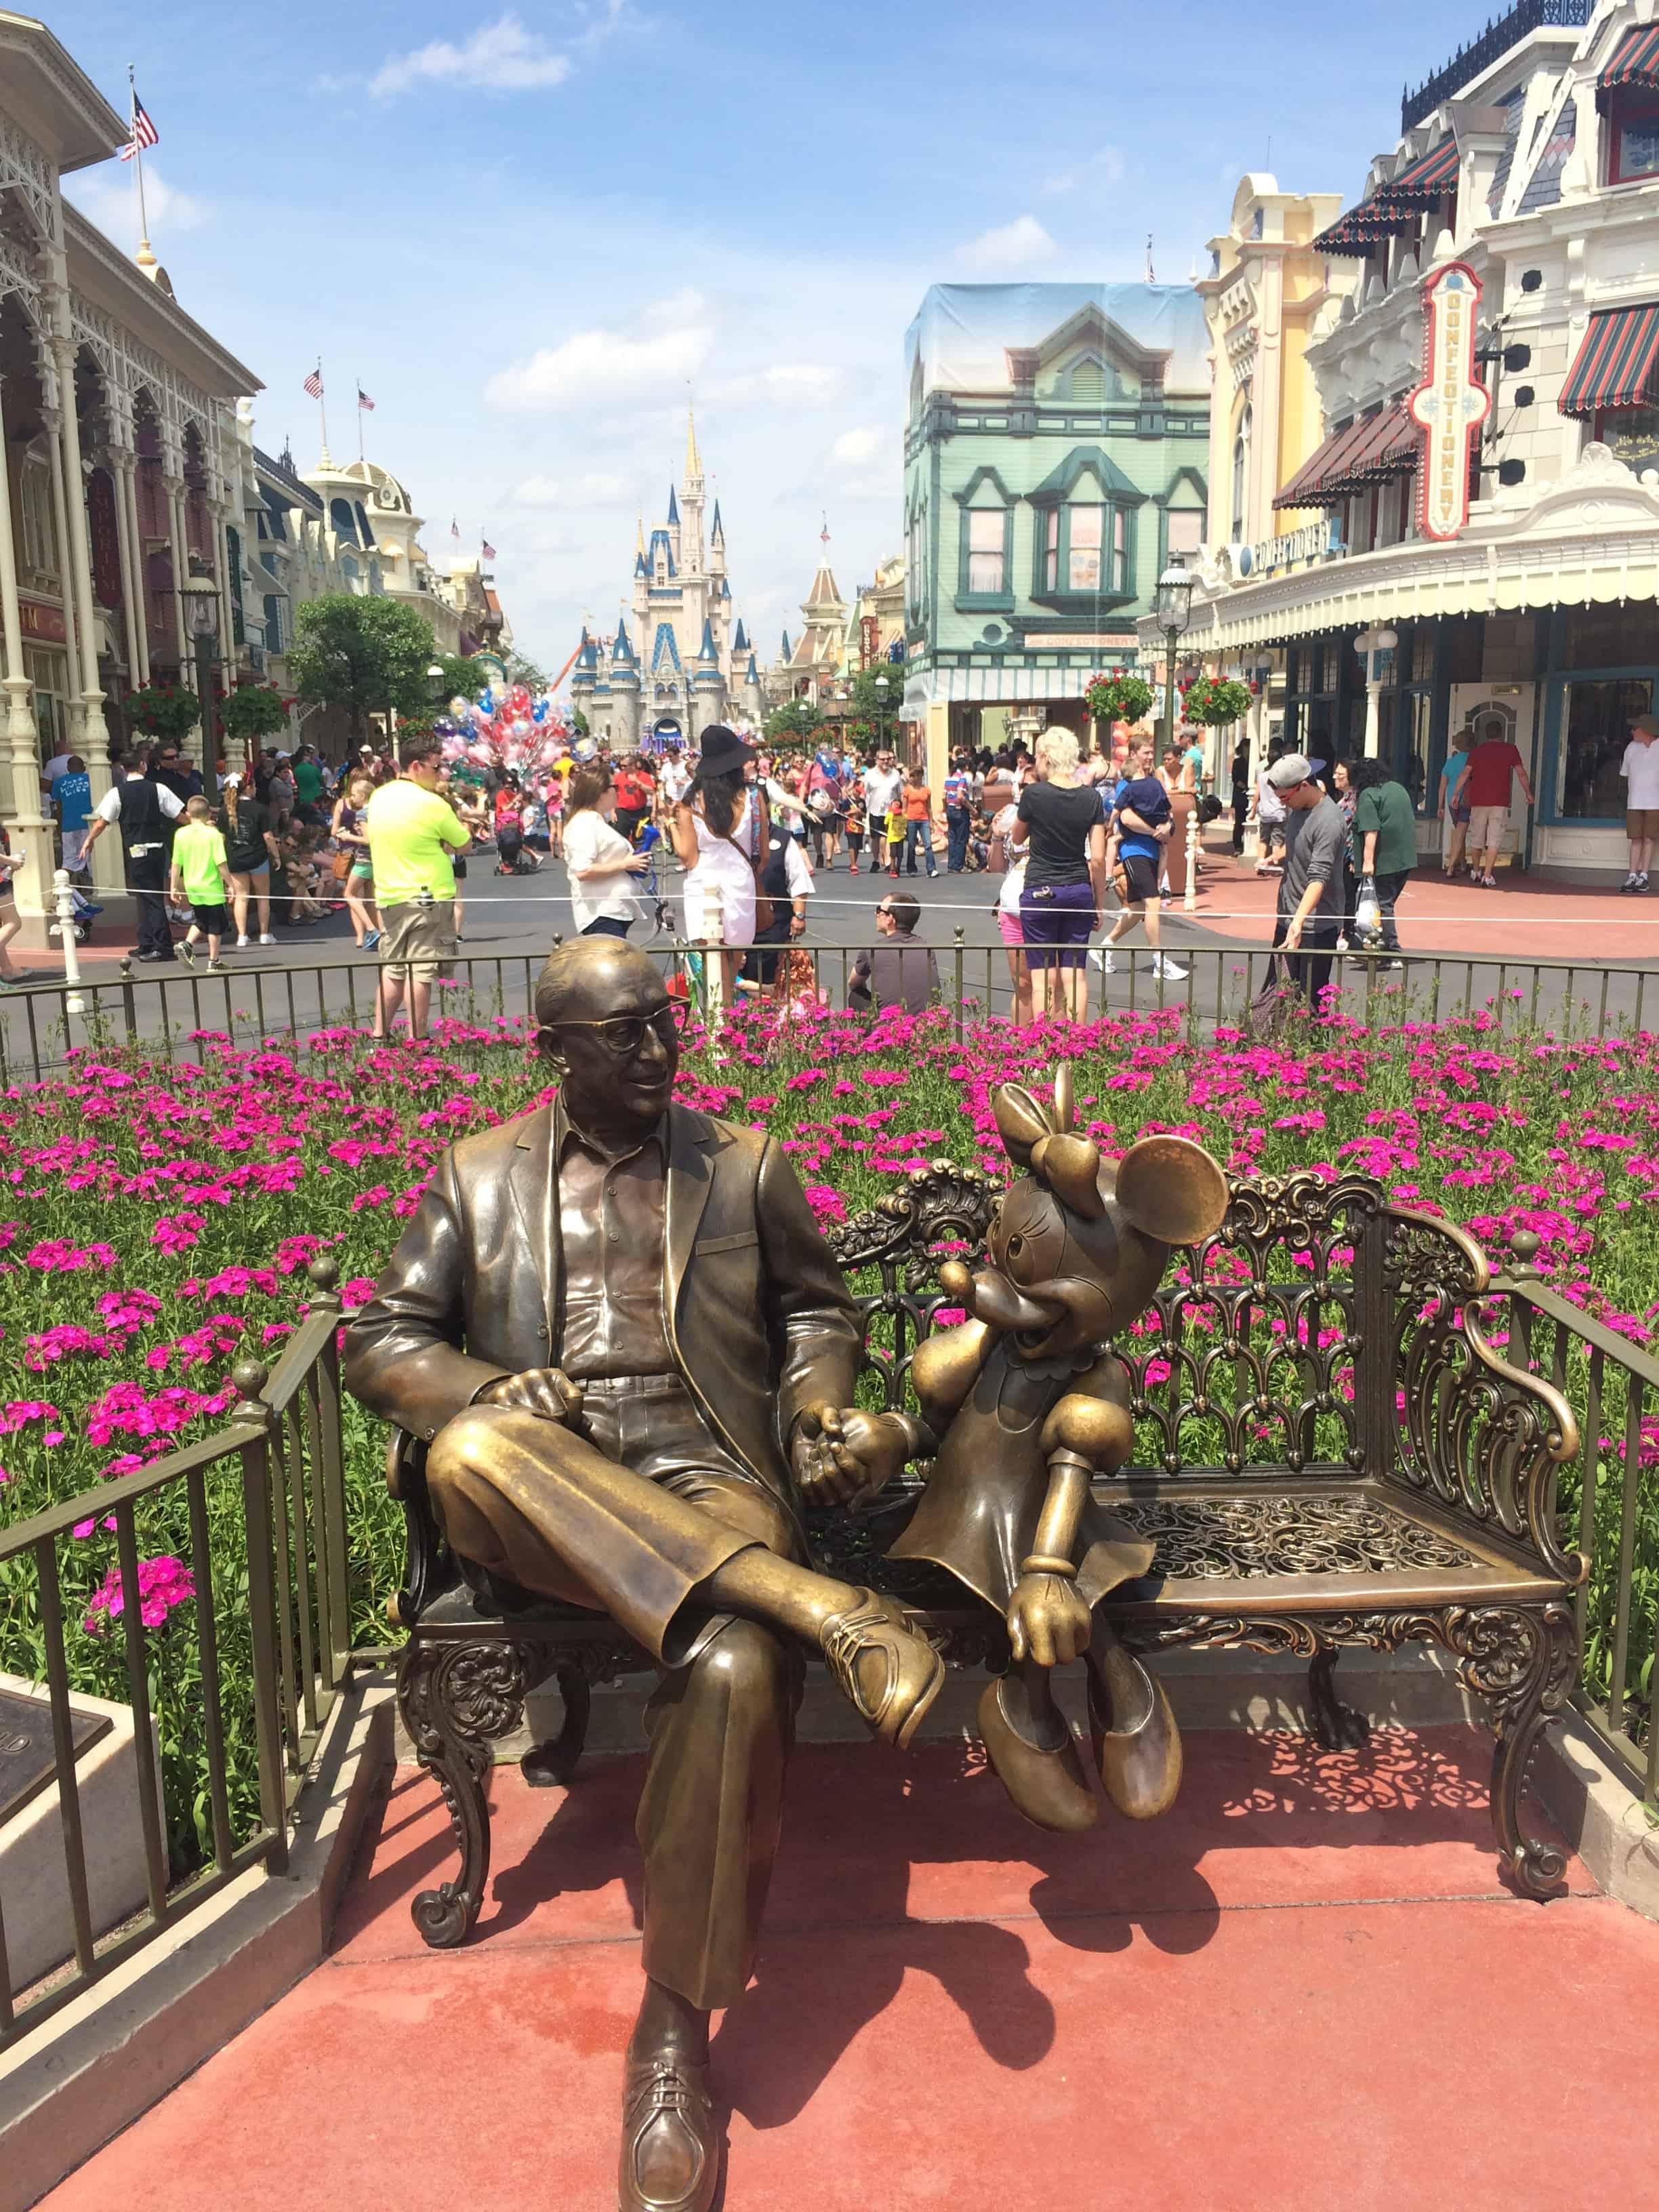 El mejor momento para ir a Disney World - Hispana Global